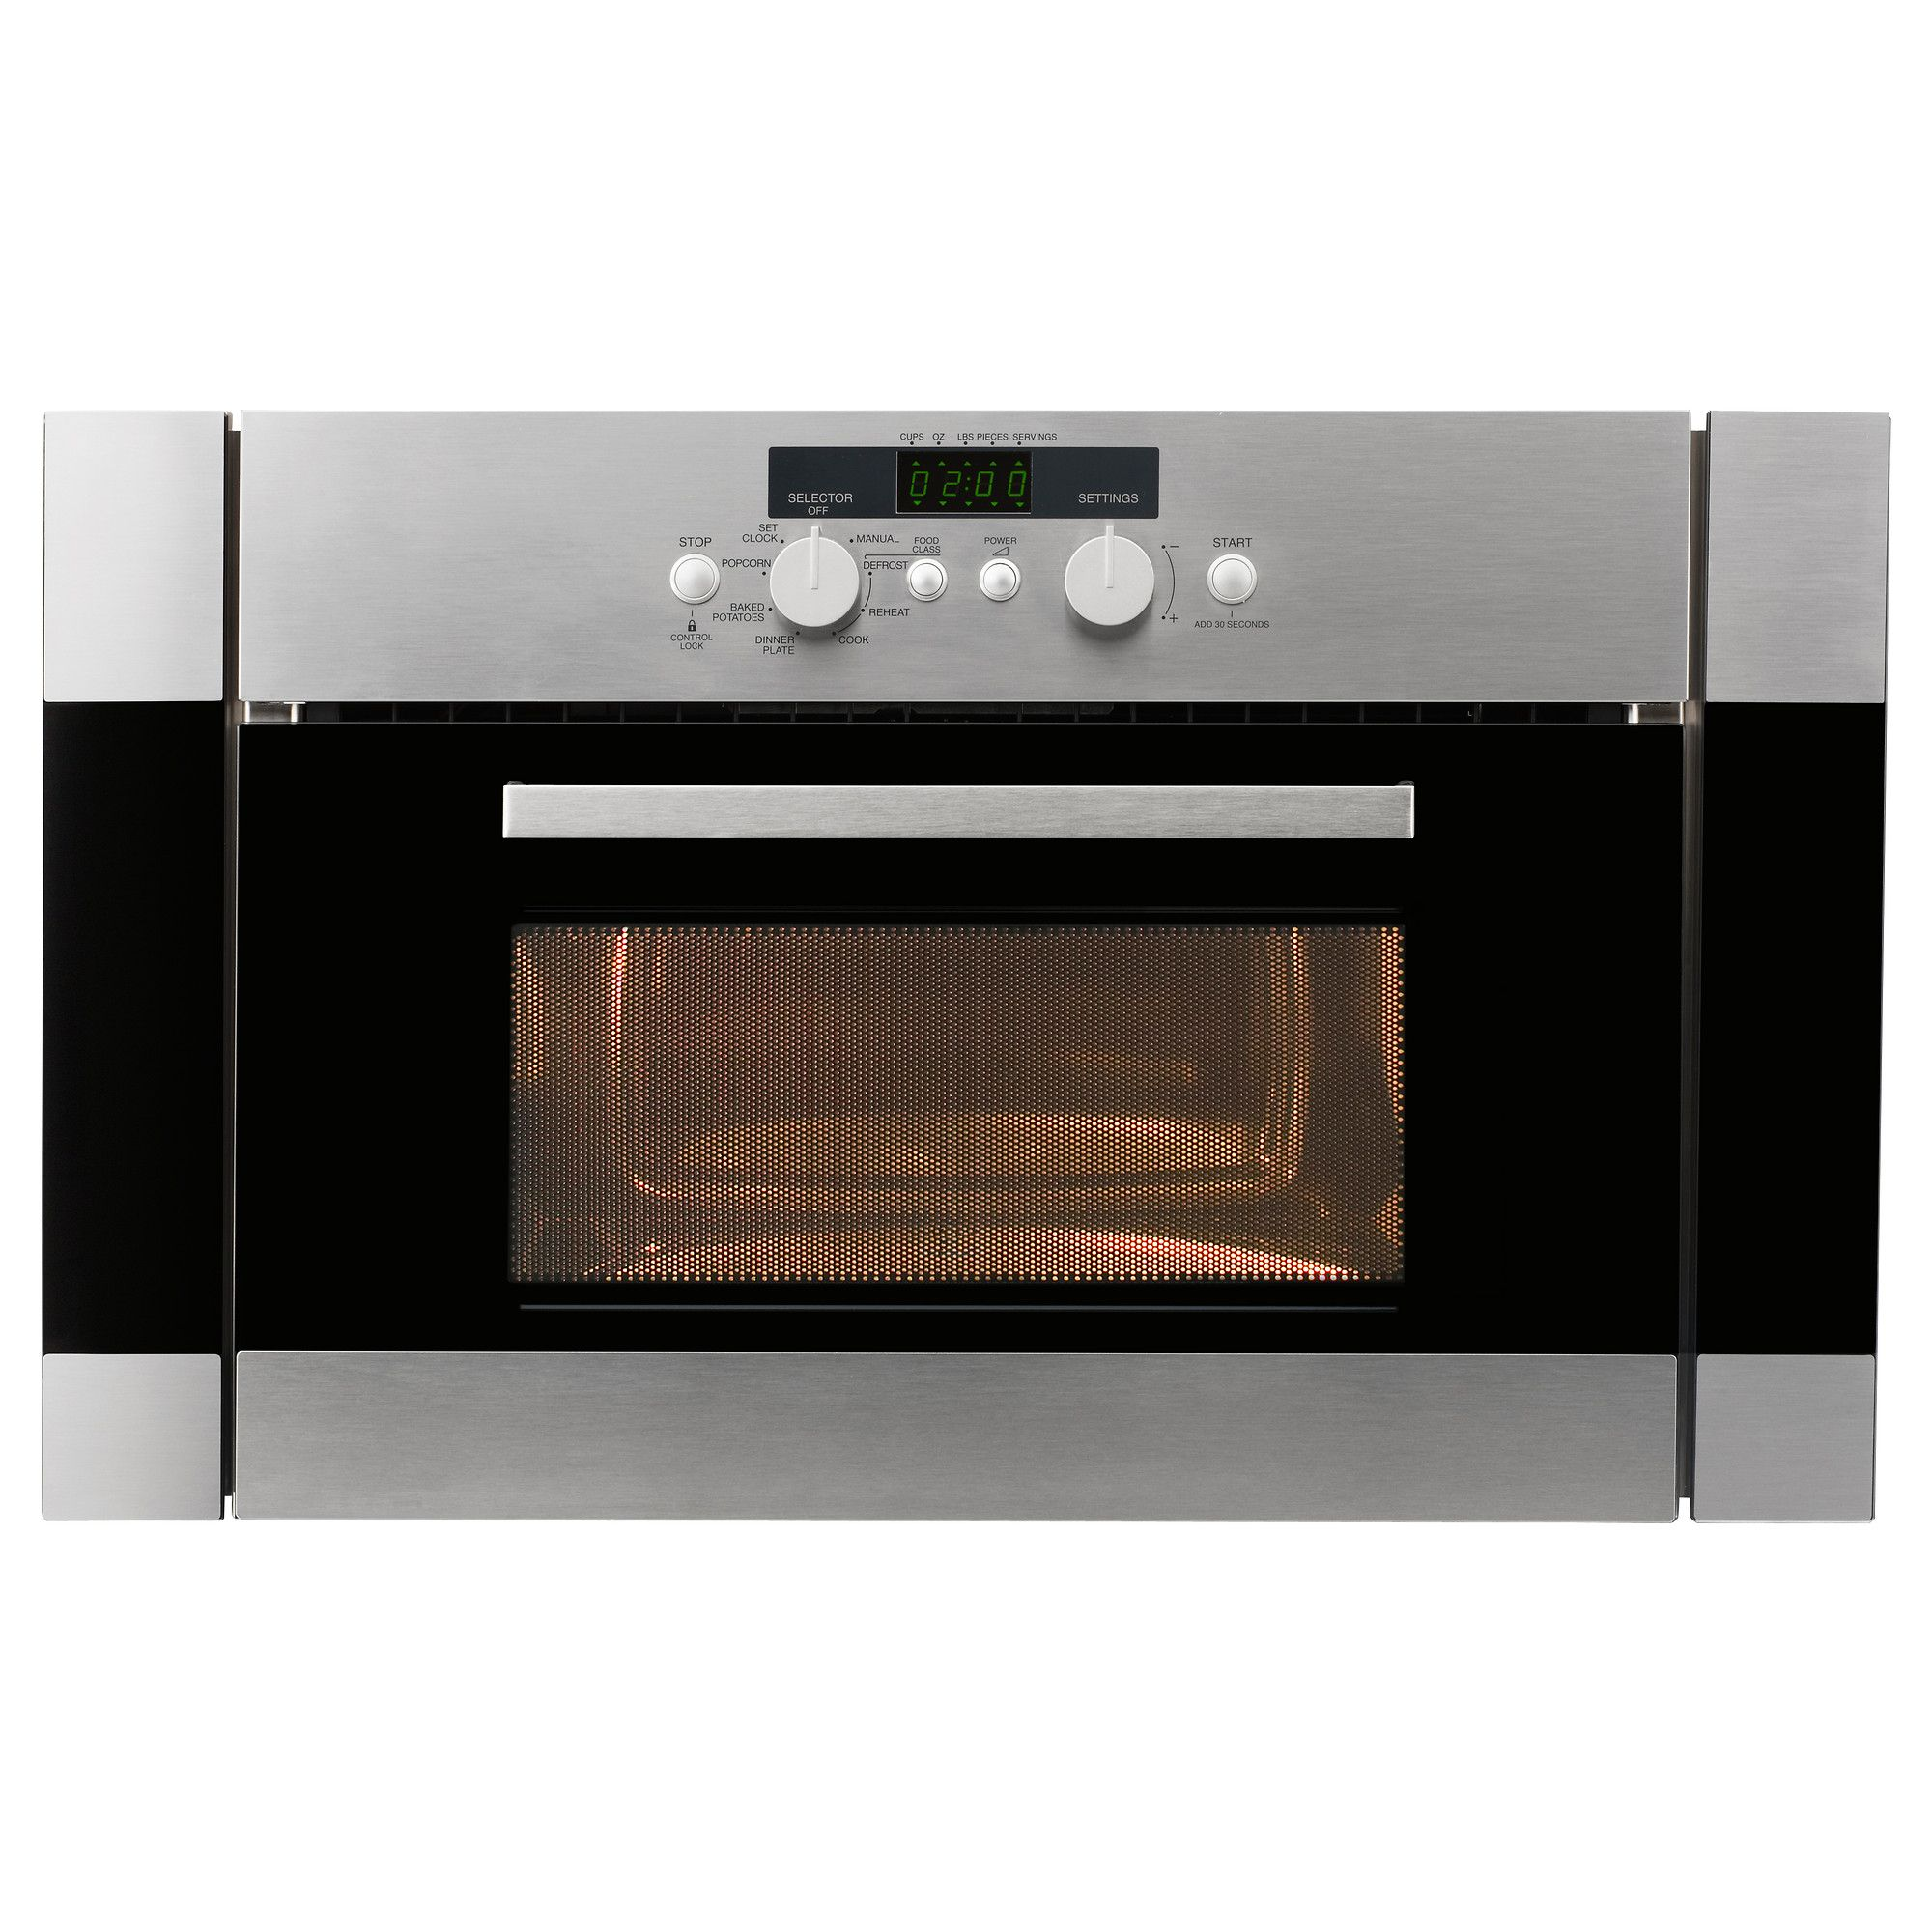 Framtid Microwave Oven Ikea